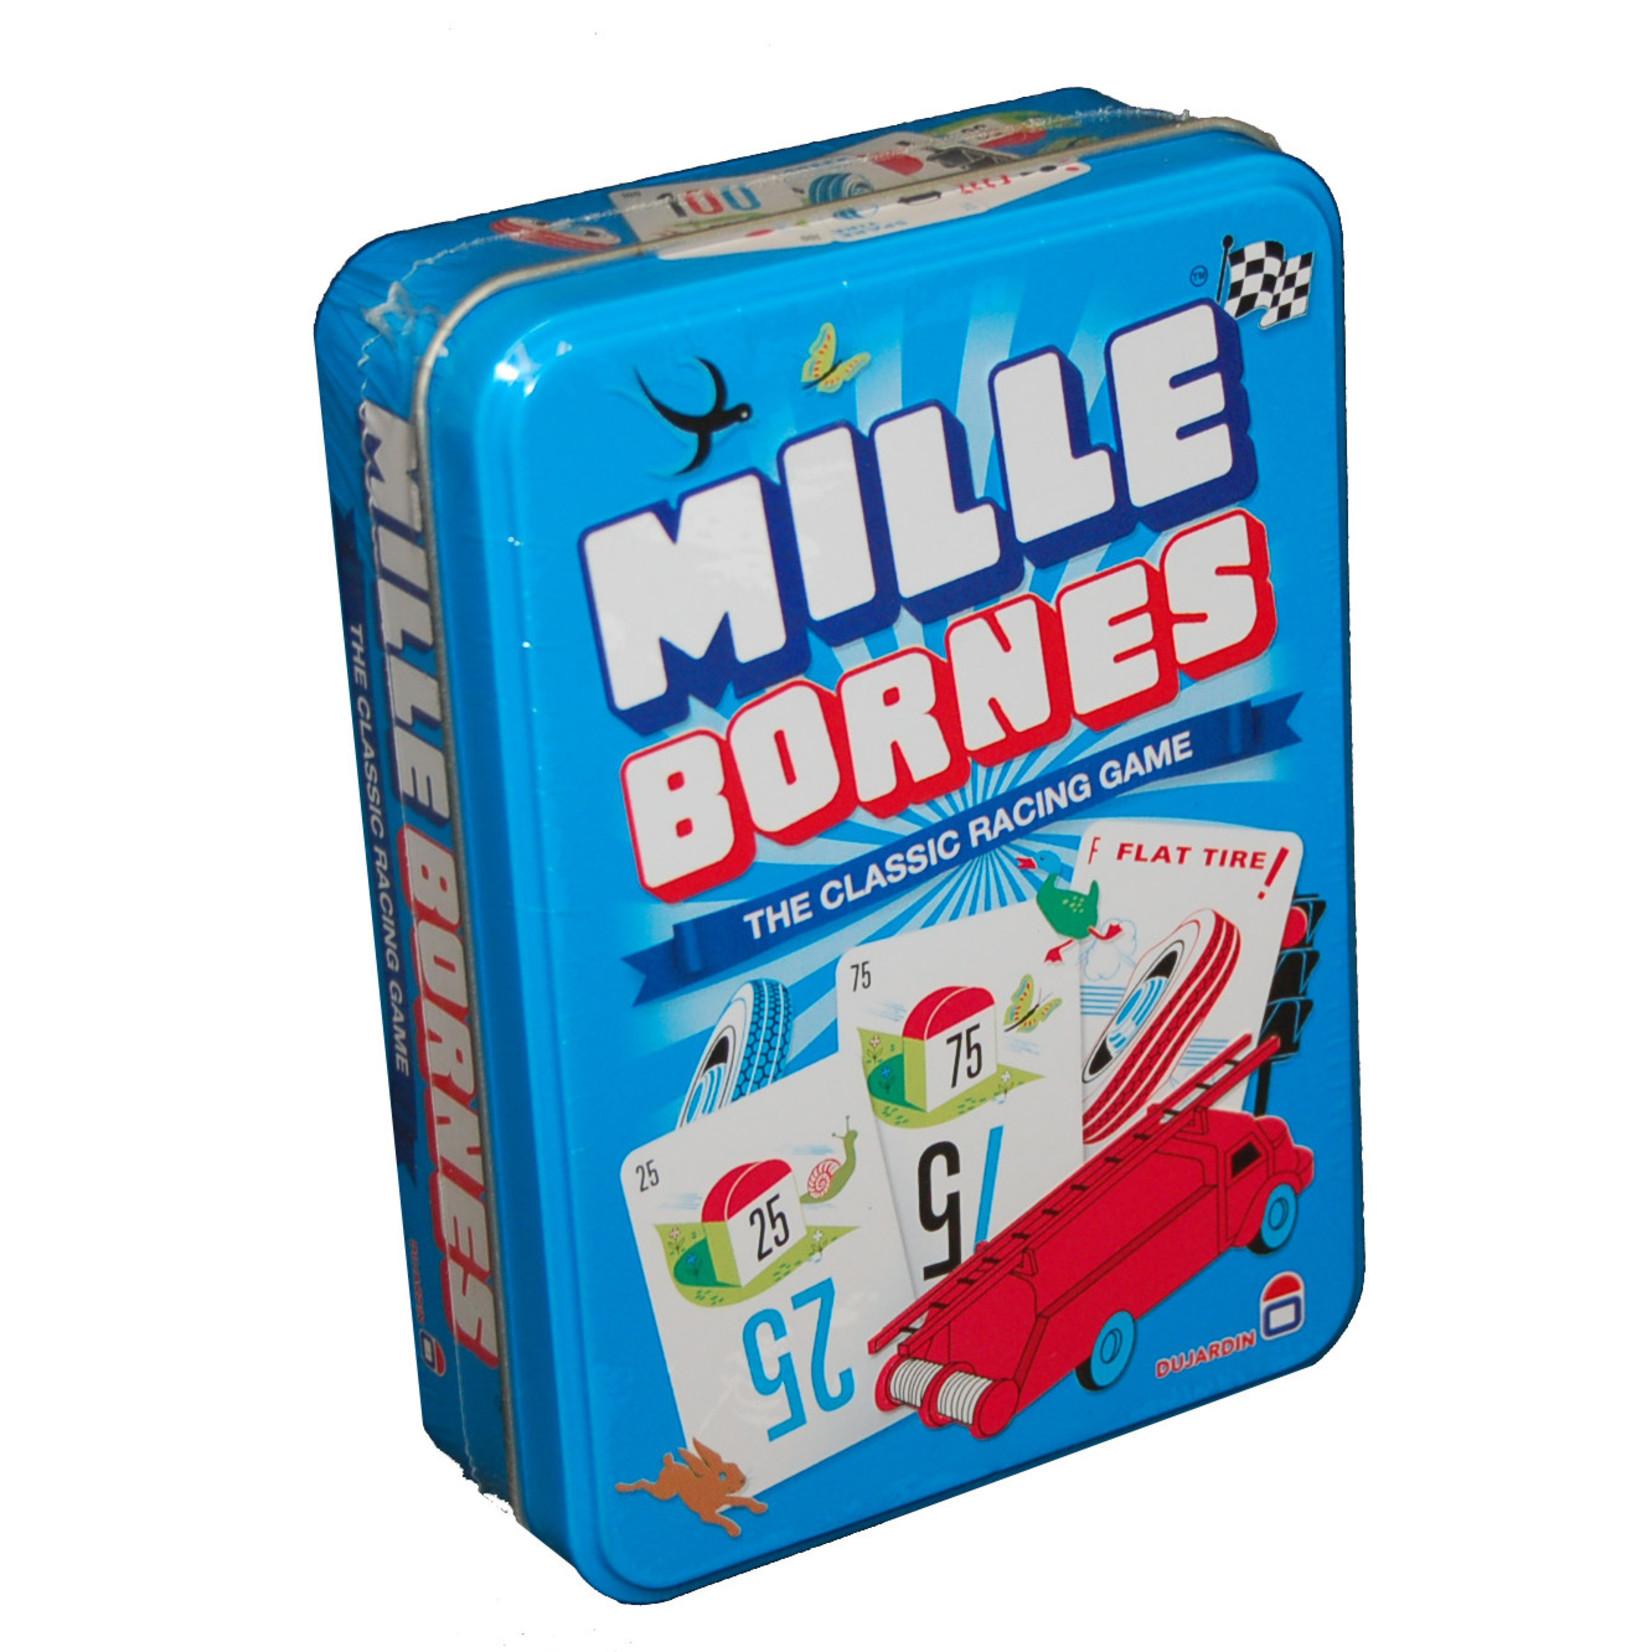 Mille Bornes - The Classic Racing Game